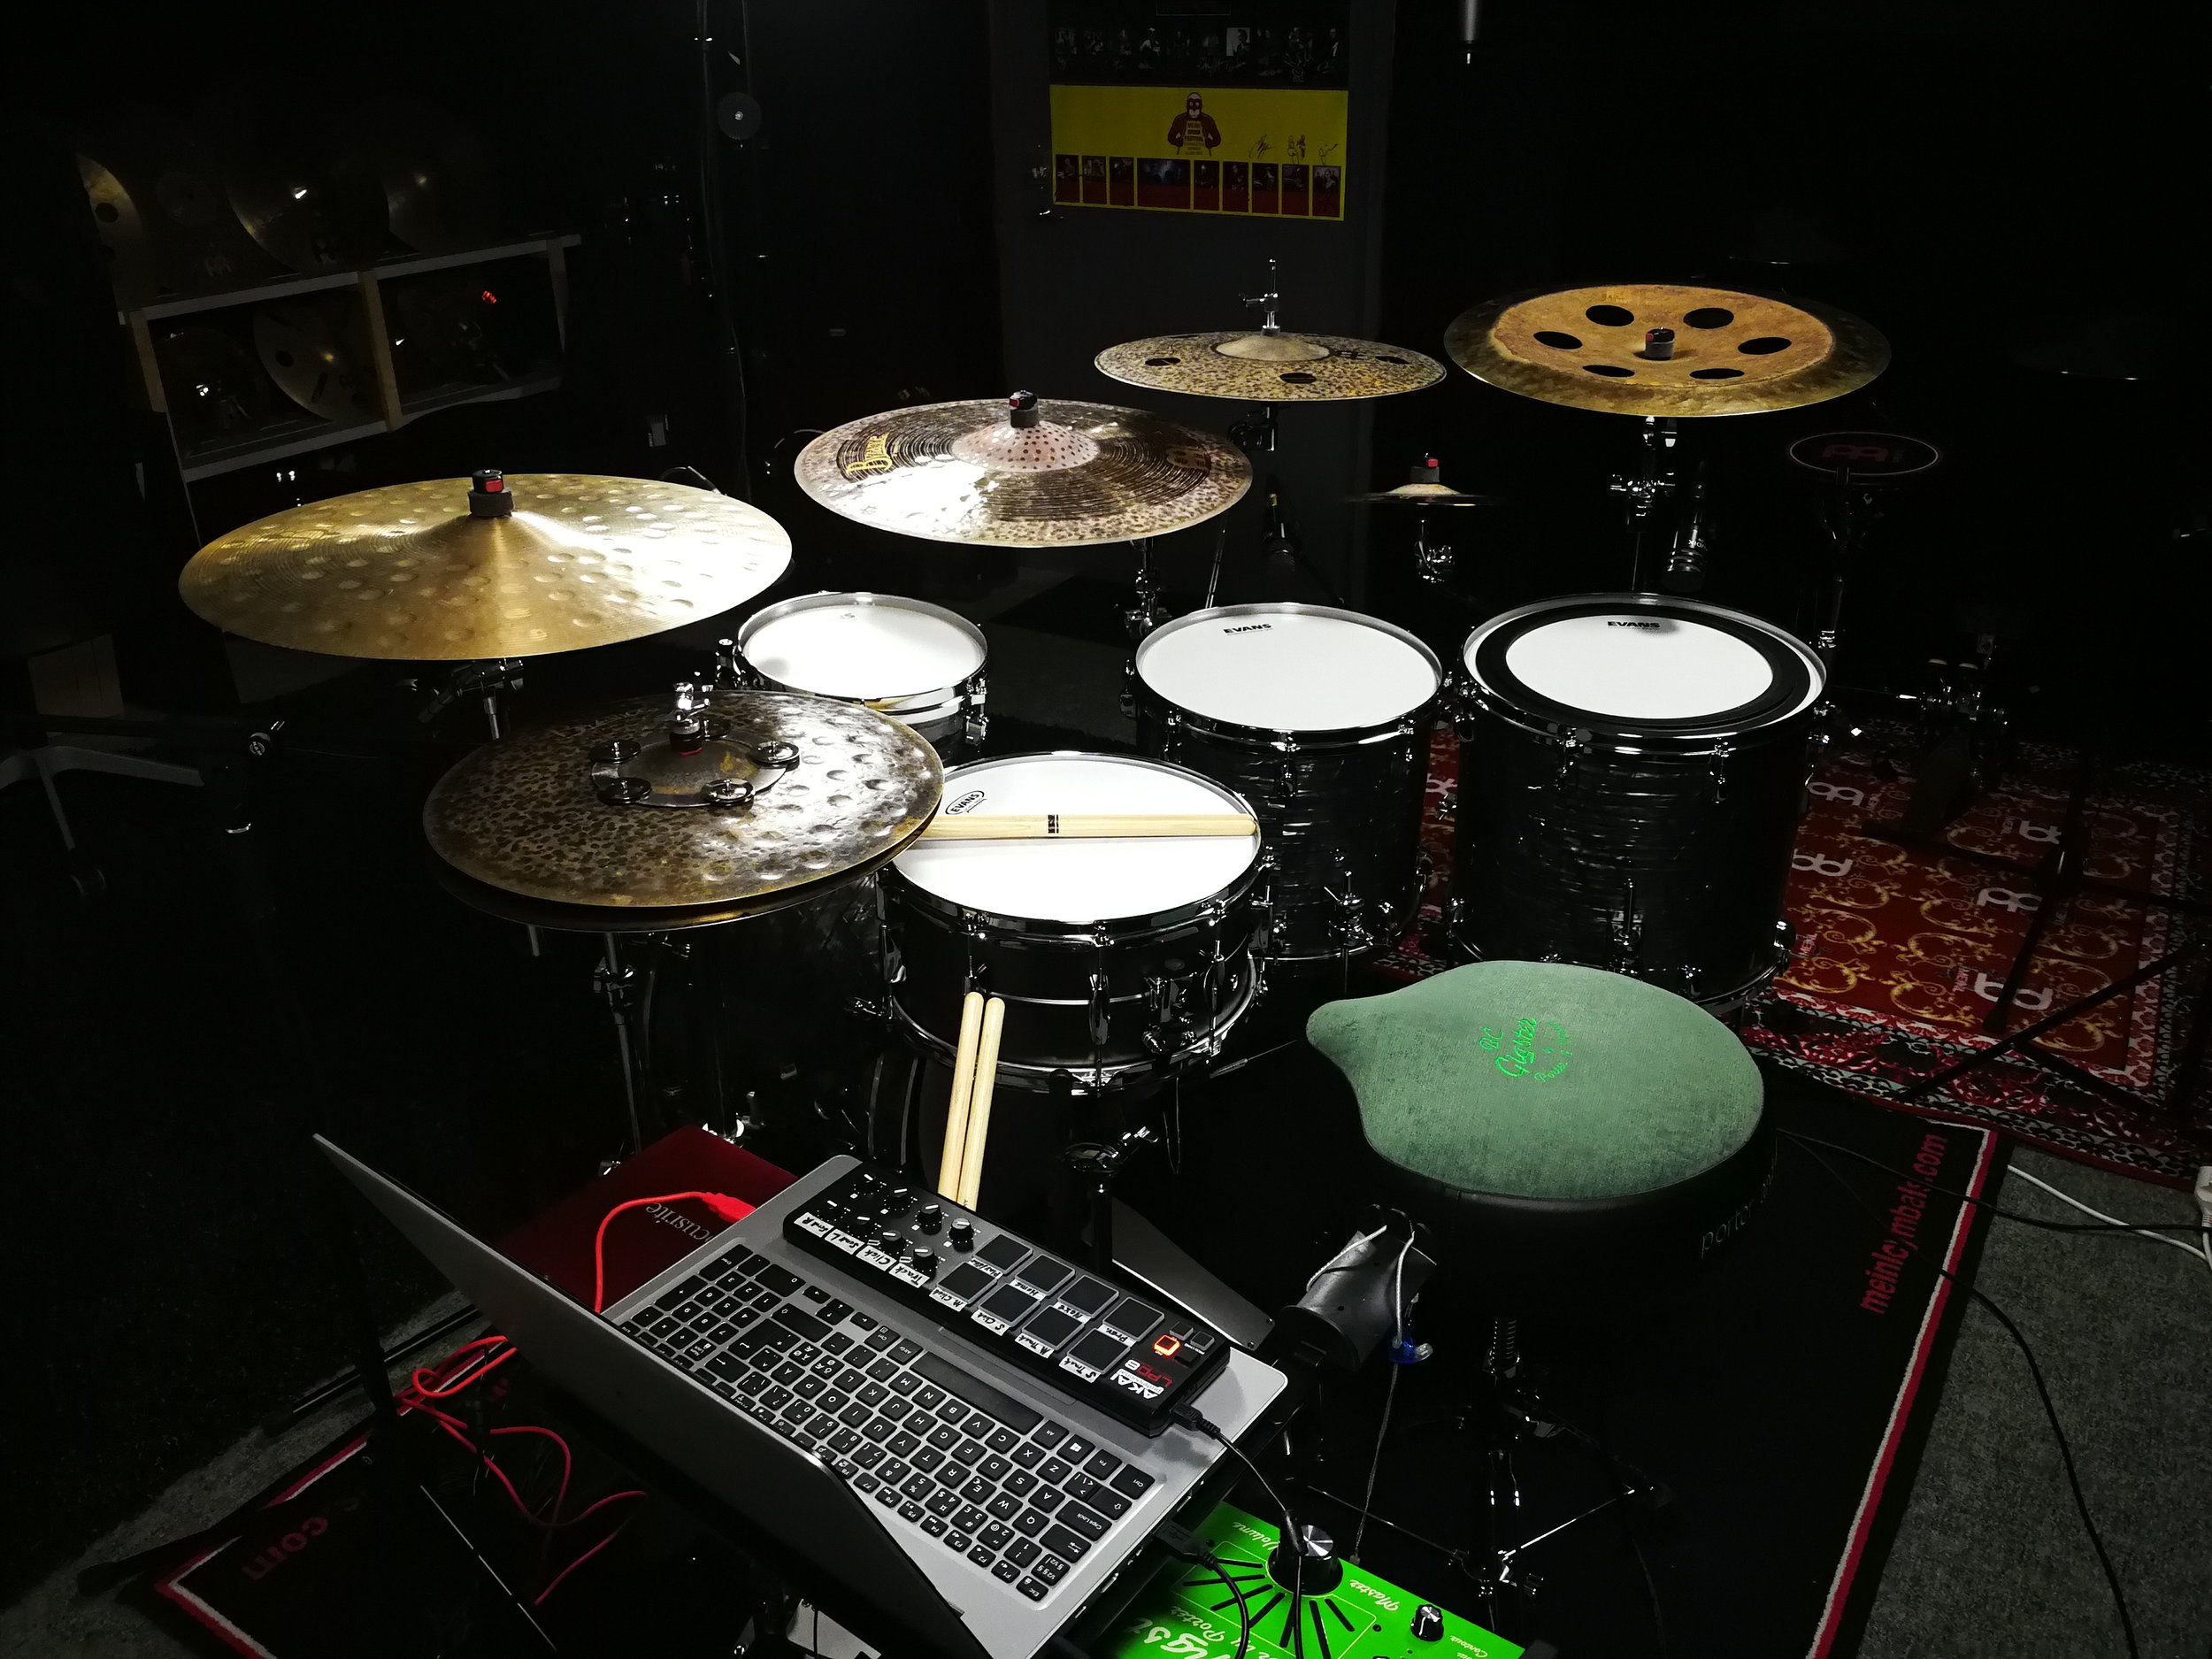 Tama Starclassic Walnut/Birch kit in Charcoal Onyx finish, with a 14x6.5 Tama Metalworks Steel snare drum.